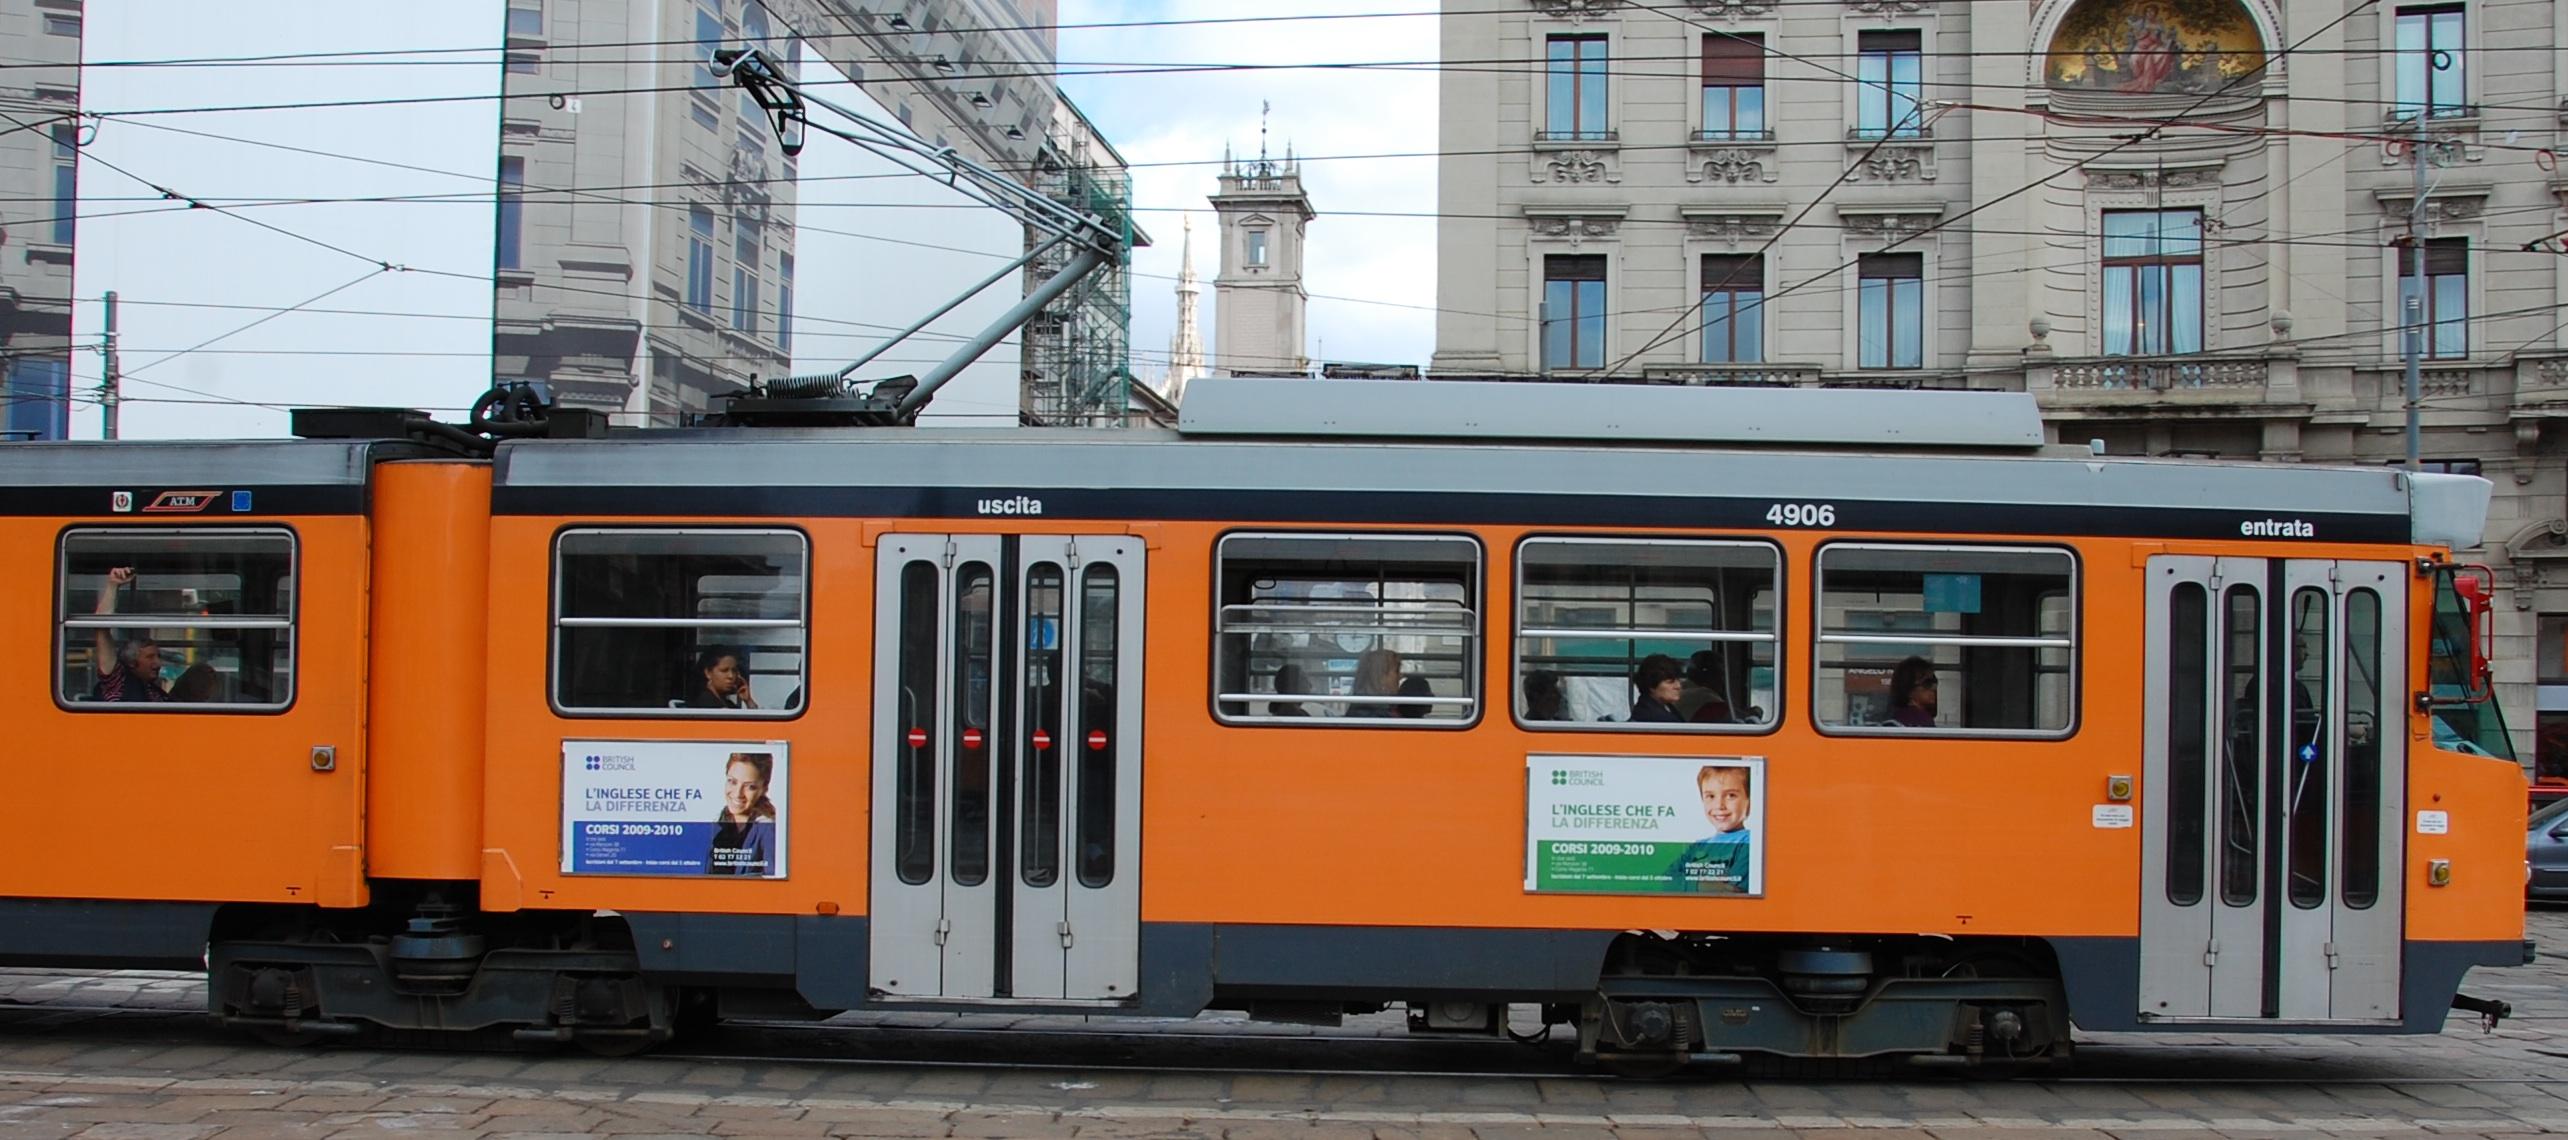 Memories of Milan, Italy: Transportation | Tony Abou-Assaleh